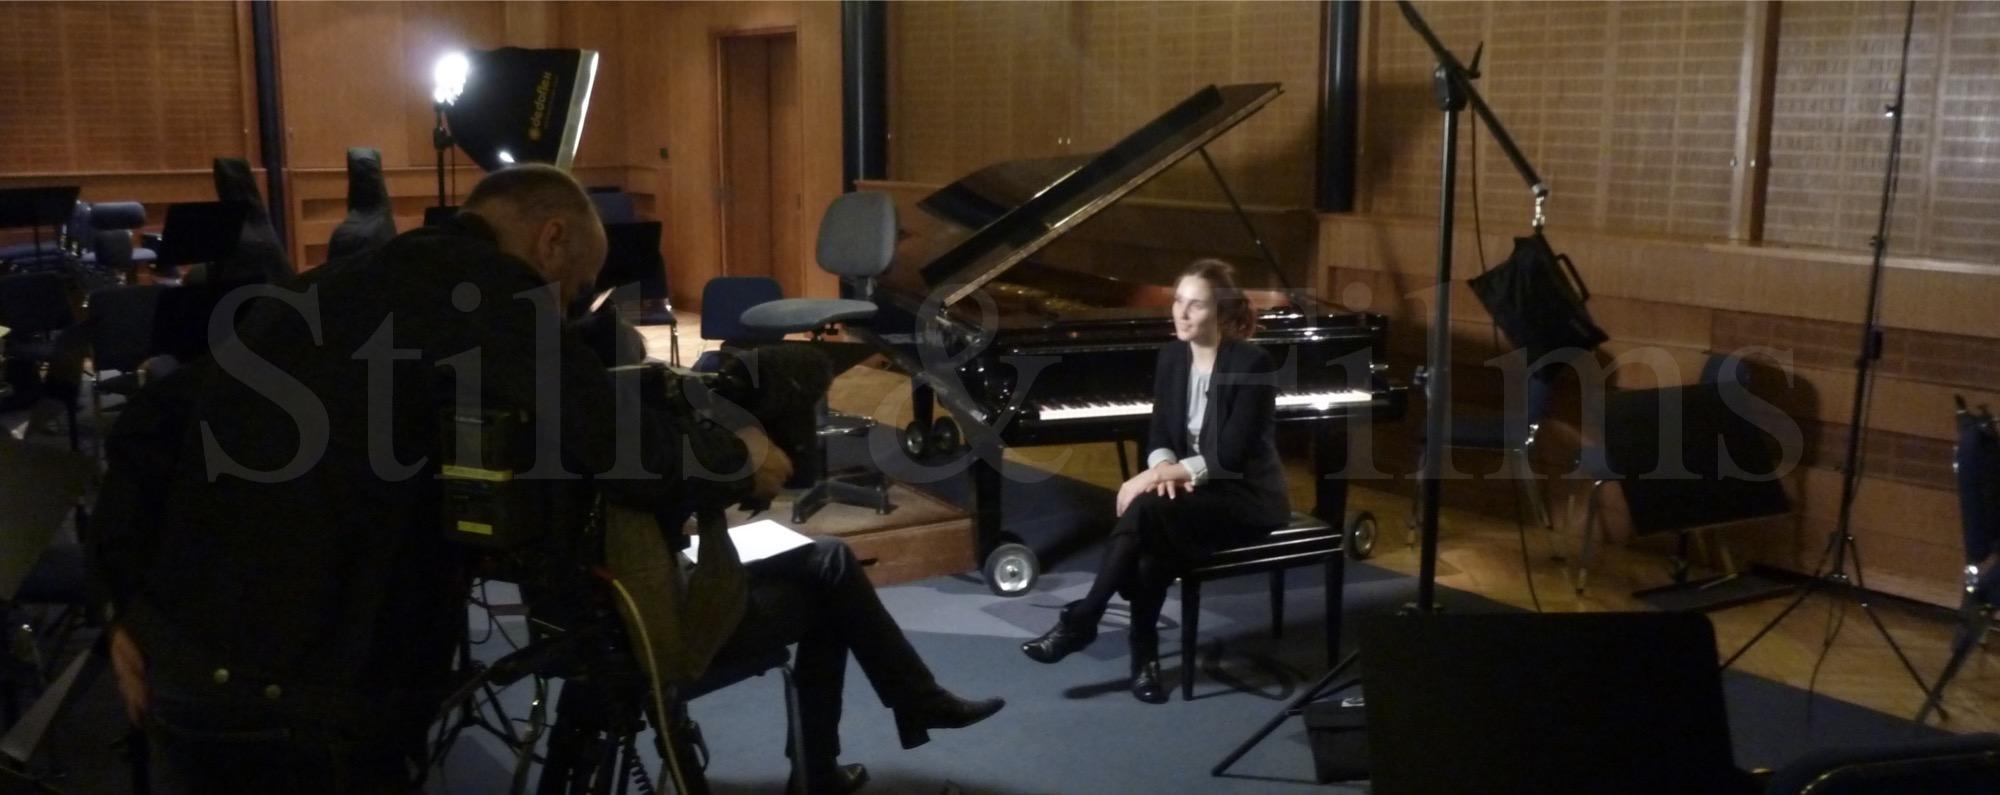 Interviewing Anna Vinnitskaya in Budapest